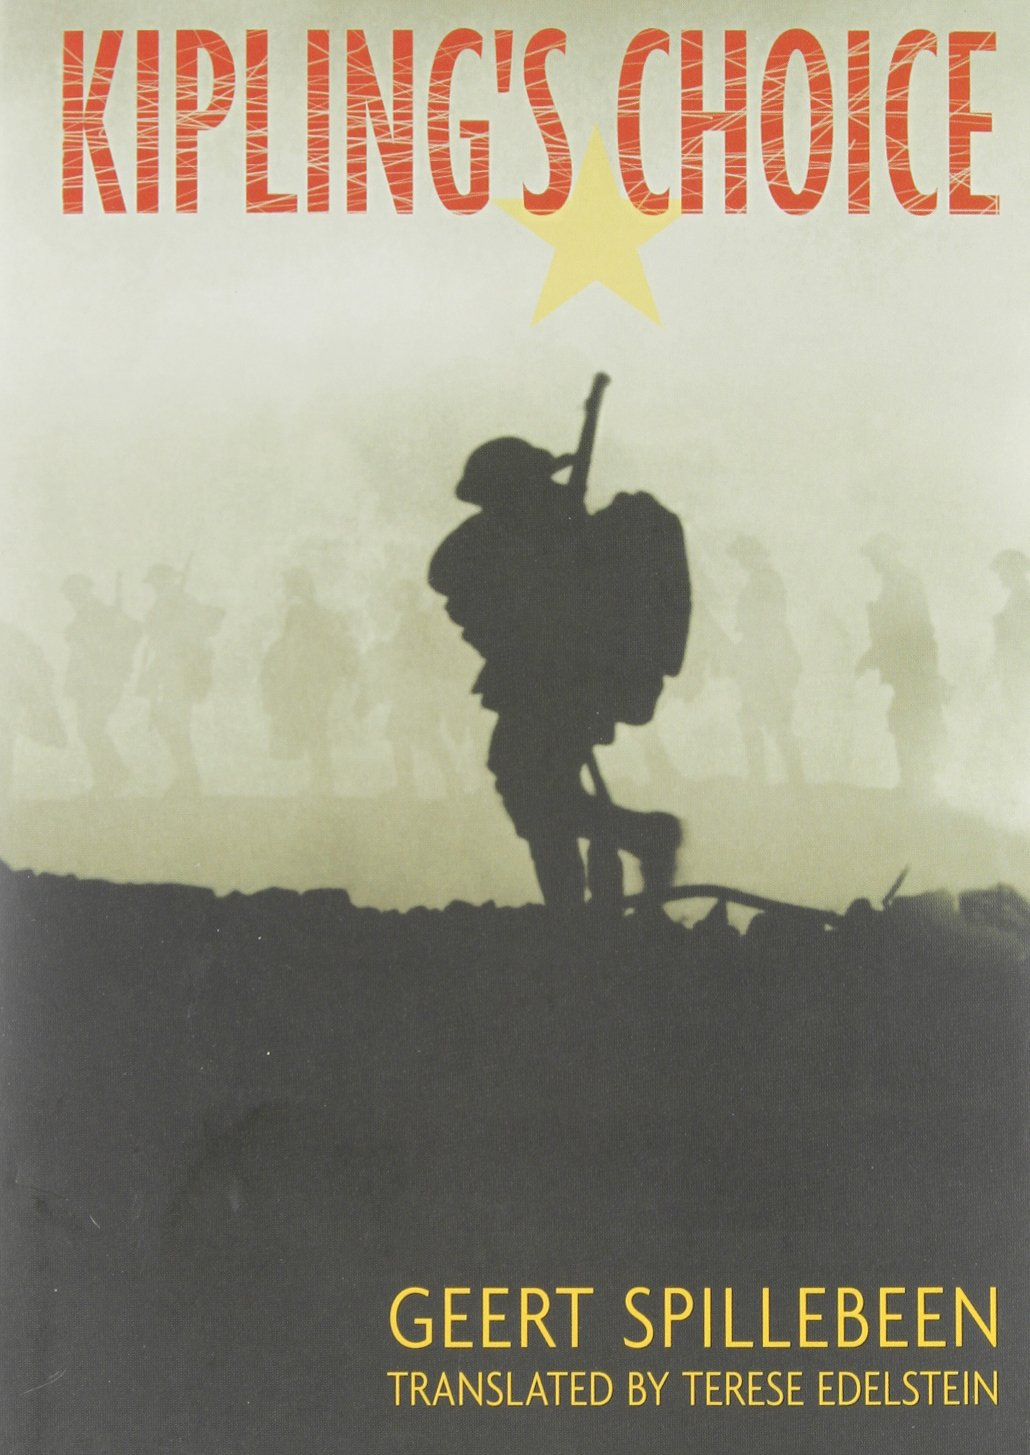 Read Online Kipling's Choice (Bccb Blue Ribbon Fiction Books (Awards)) PDF